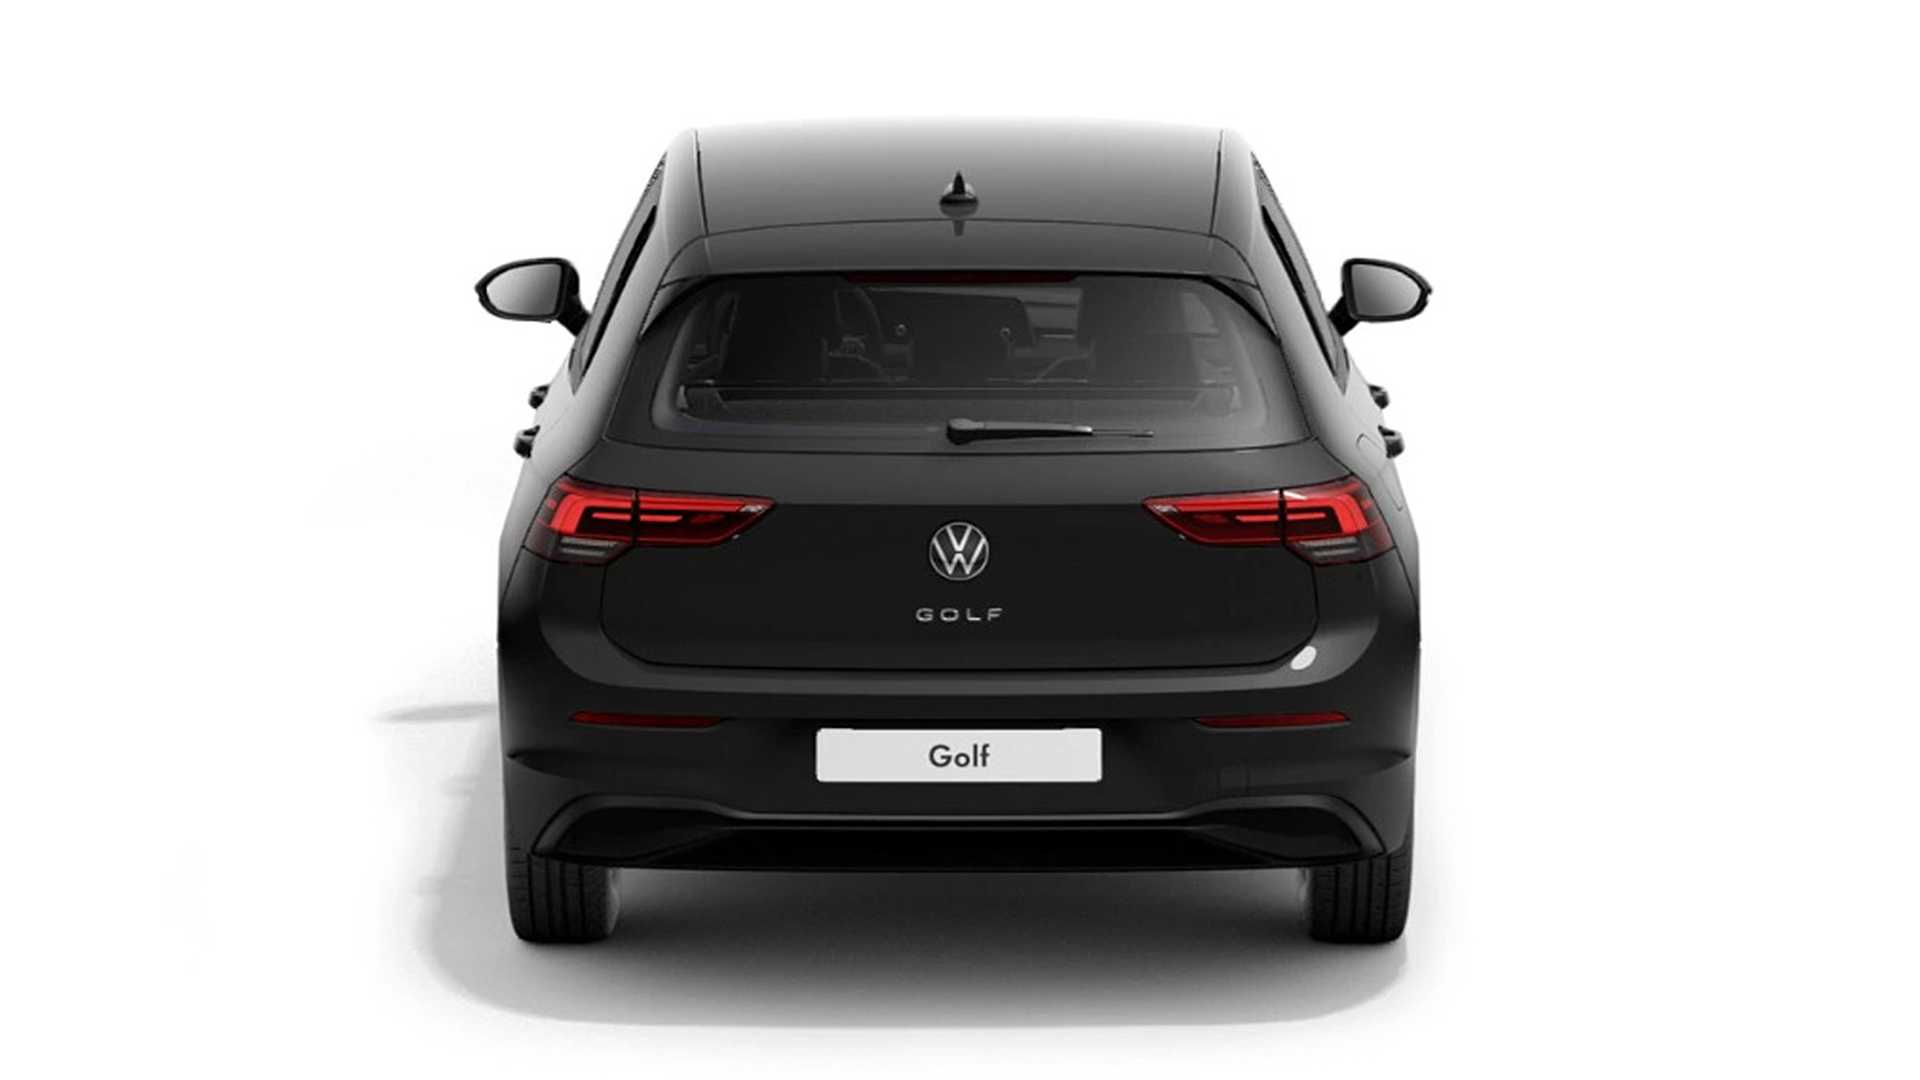 Volkswagen-Golf-2020-Base-Model-6